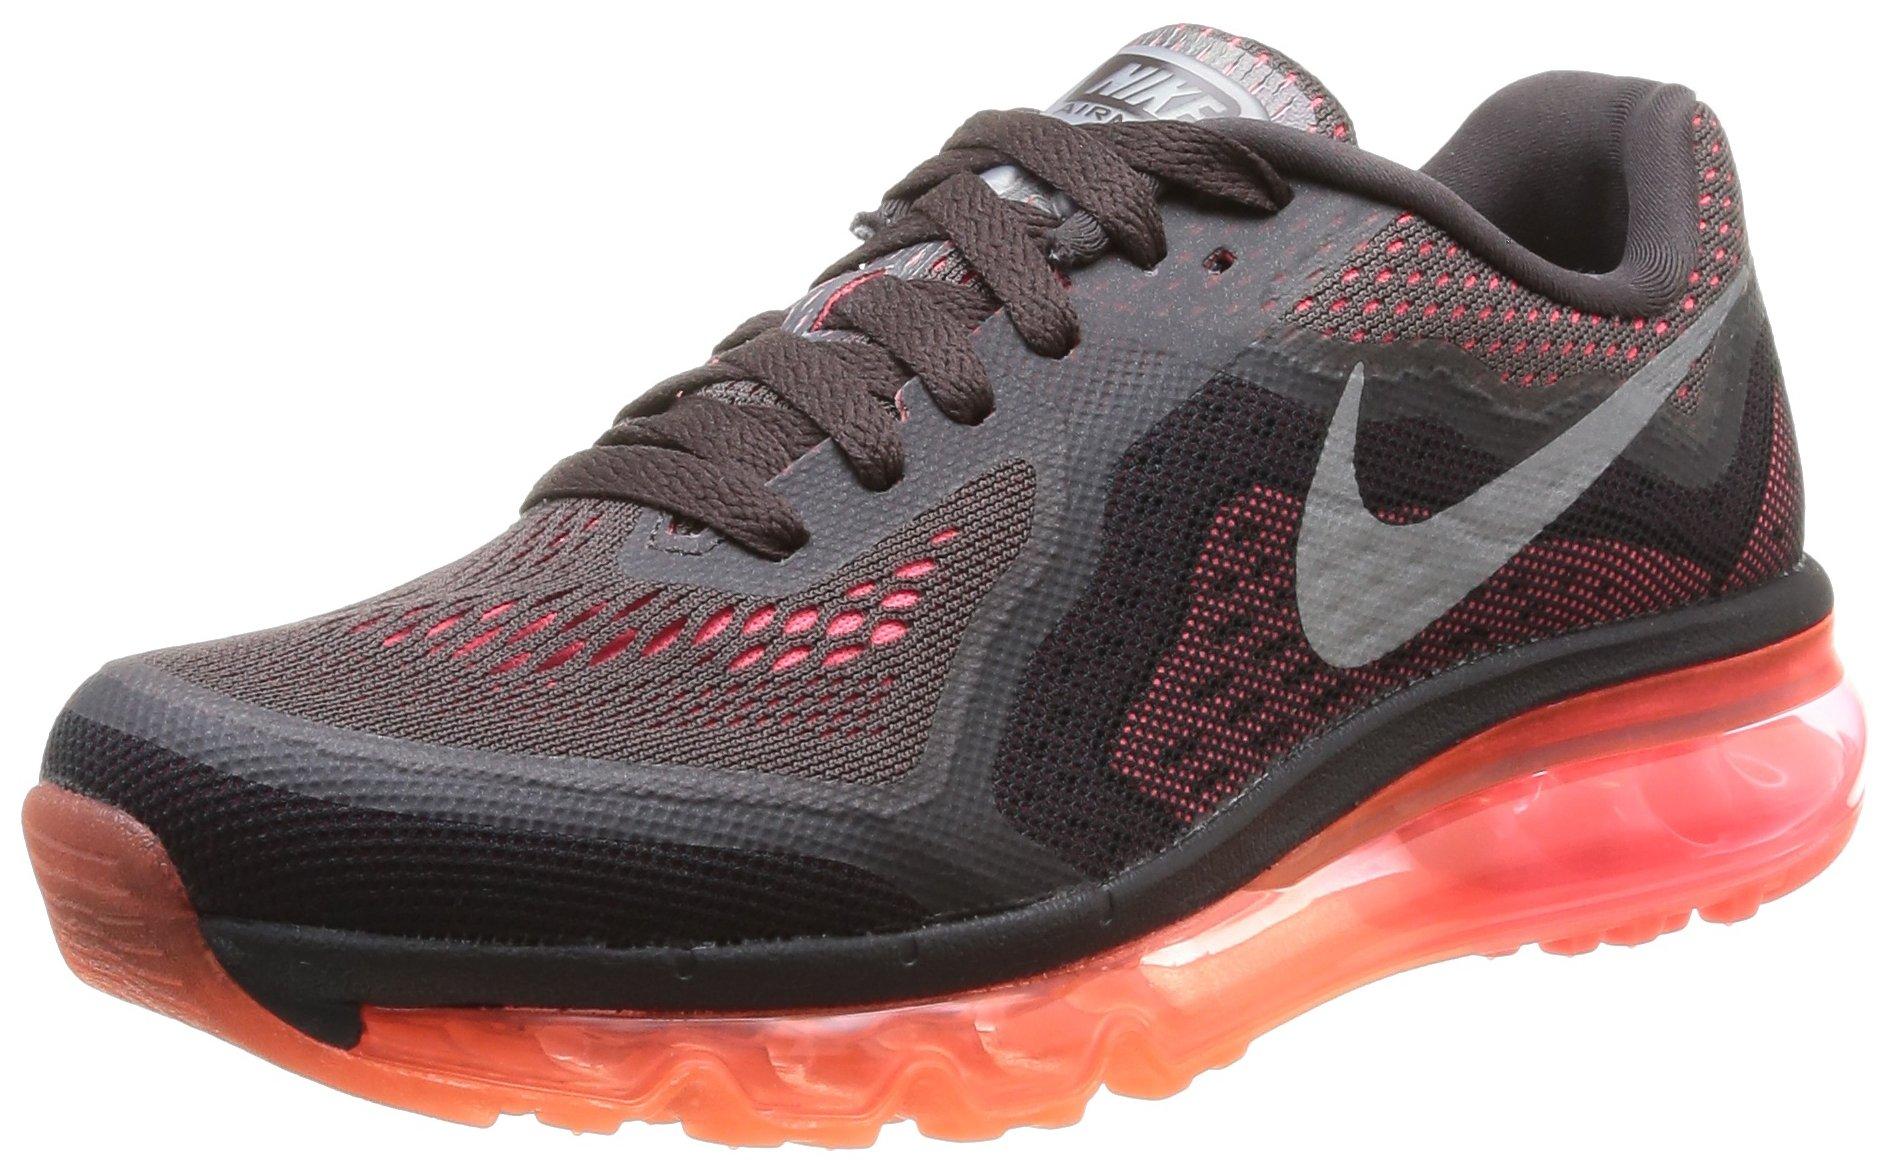 Nike Air Max 2014 Womens Running Shoes